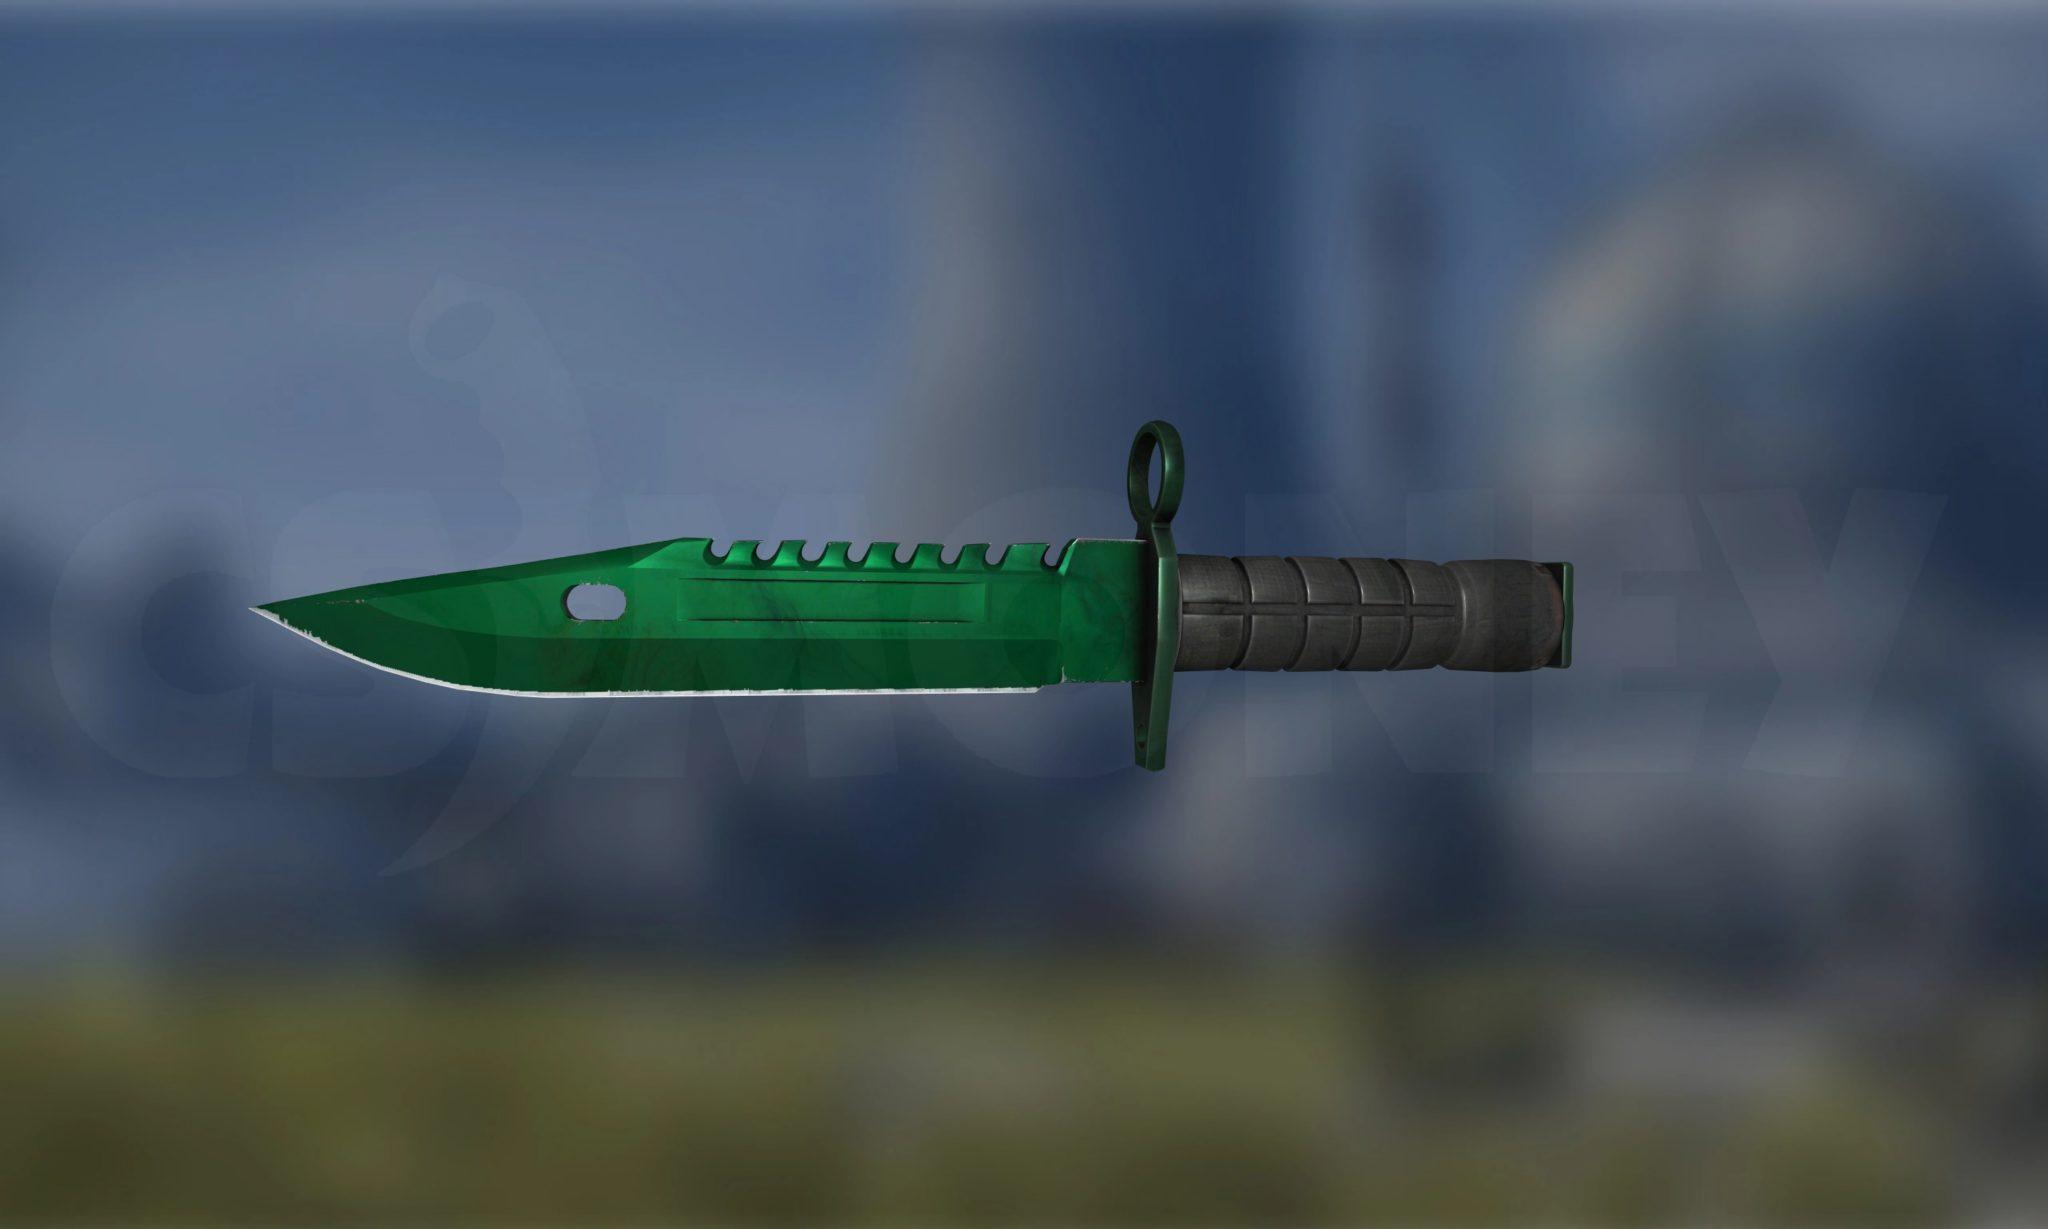 M9 Bayonet Gamma Doppler Emerald (Factory New)